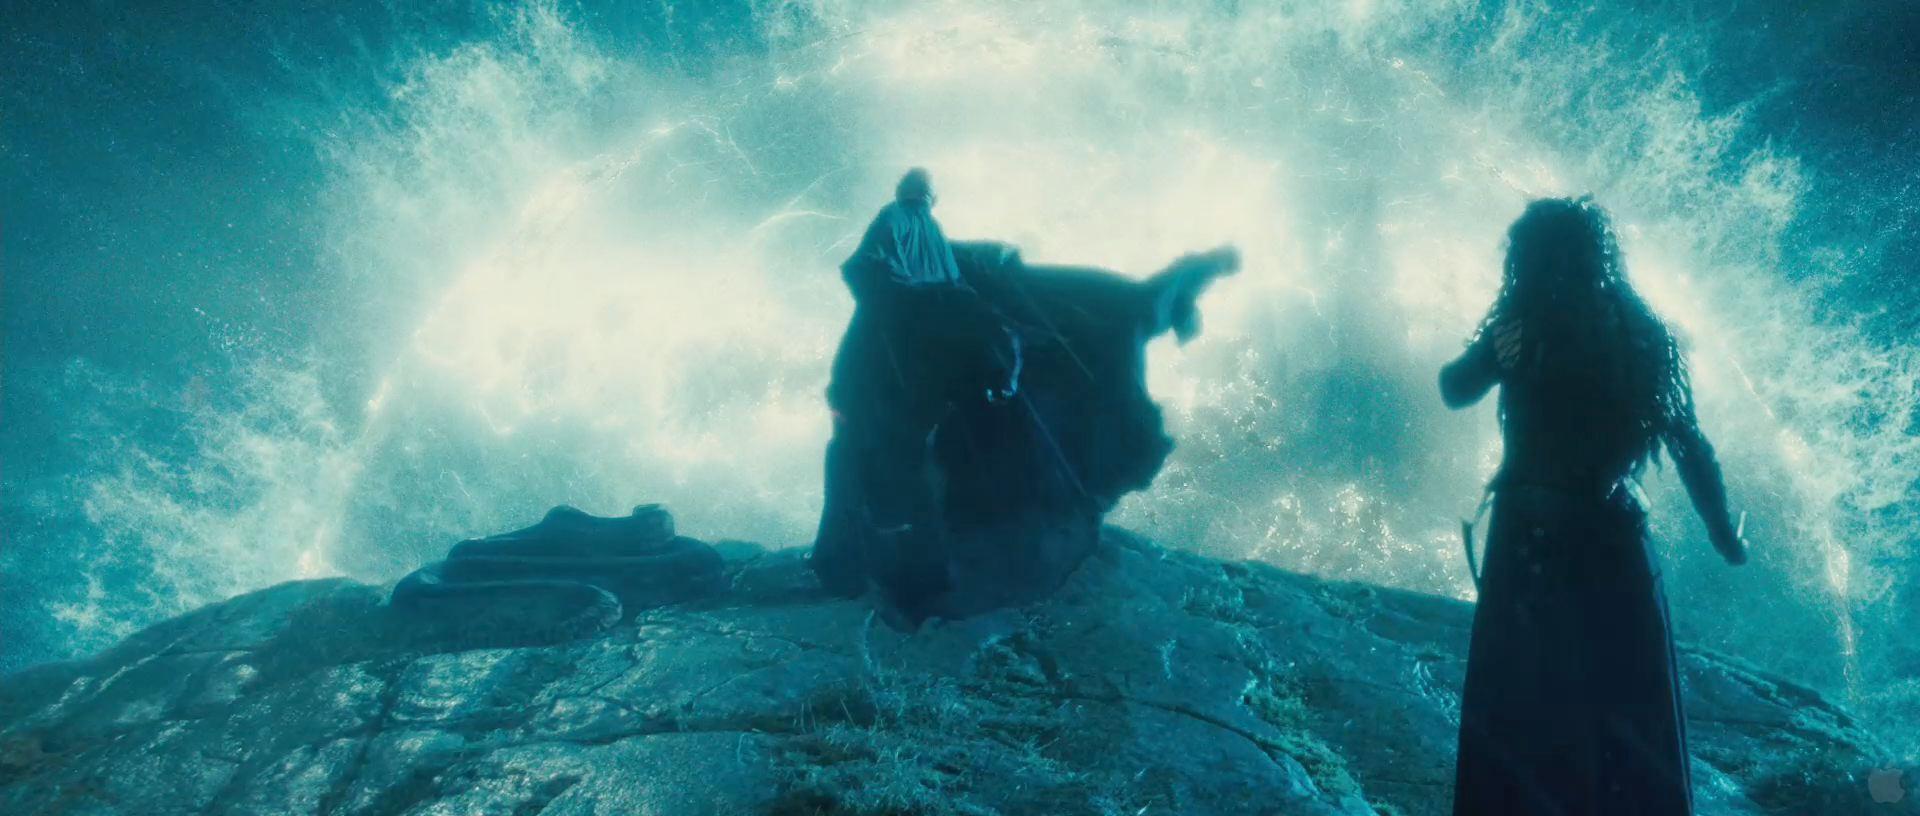 Harry Potter BlogHogwarts HP7 2 Trailer 53